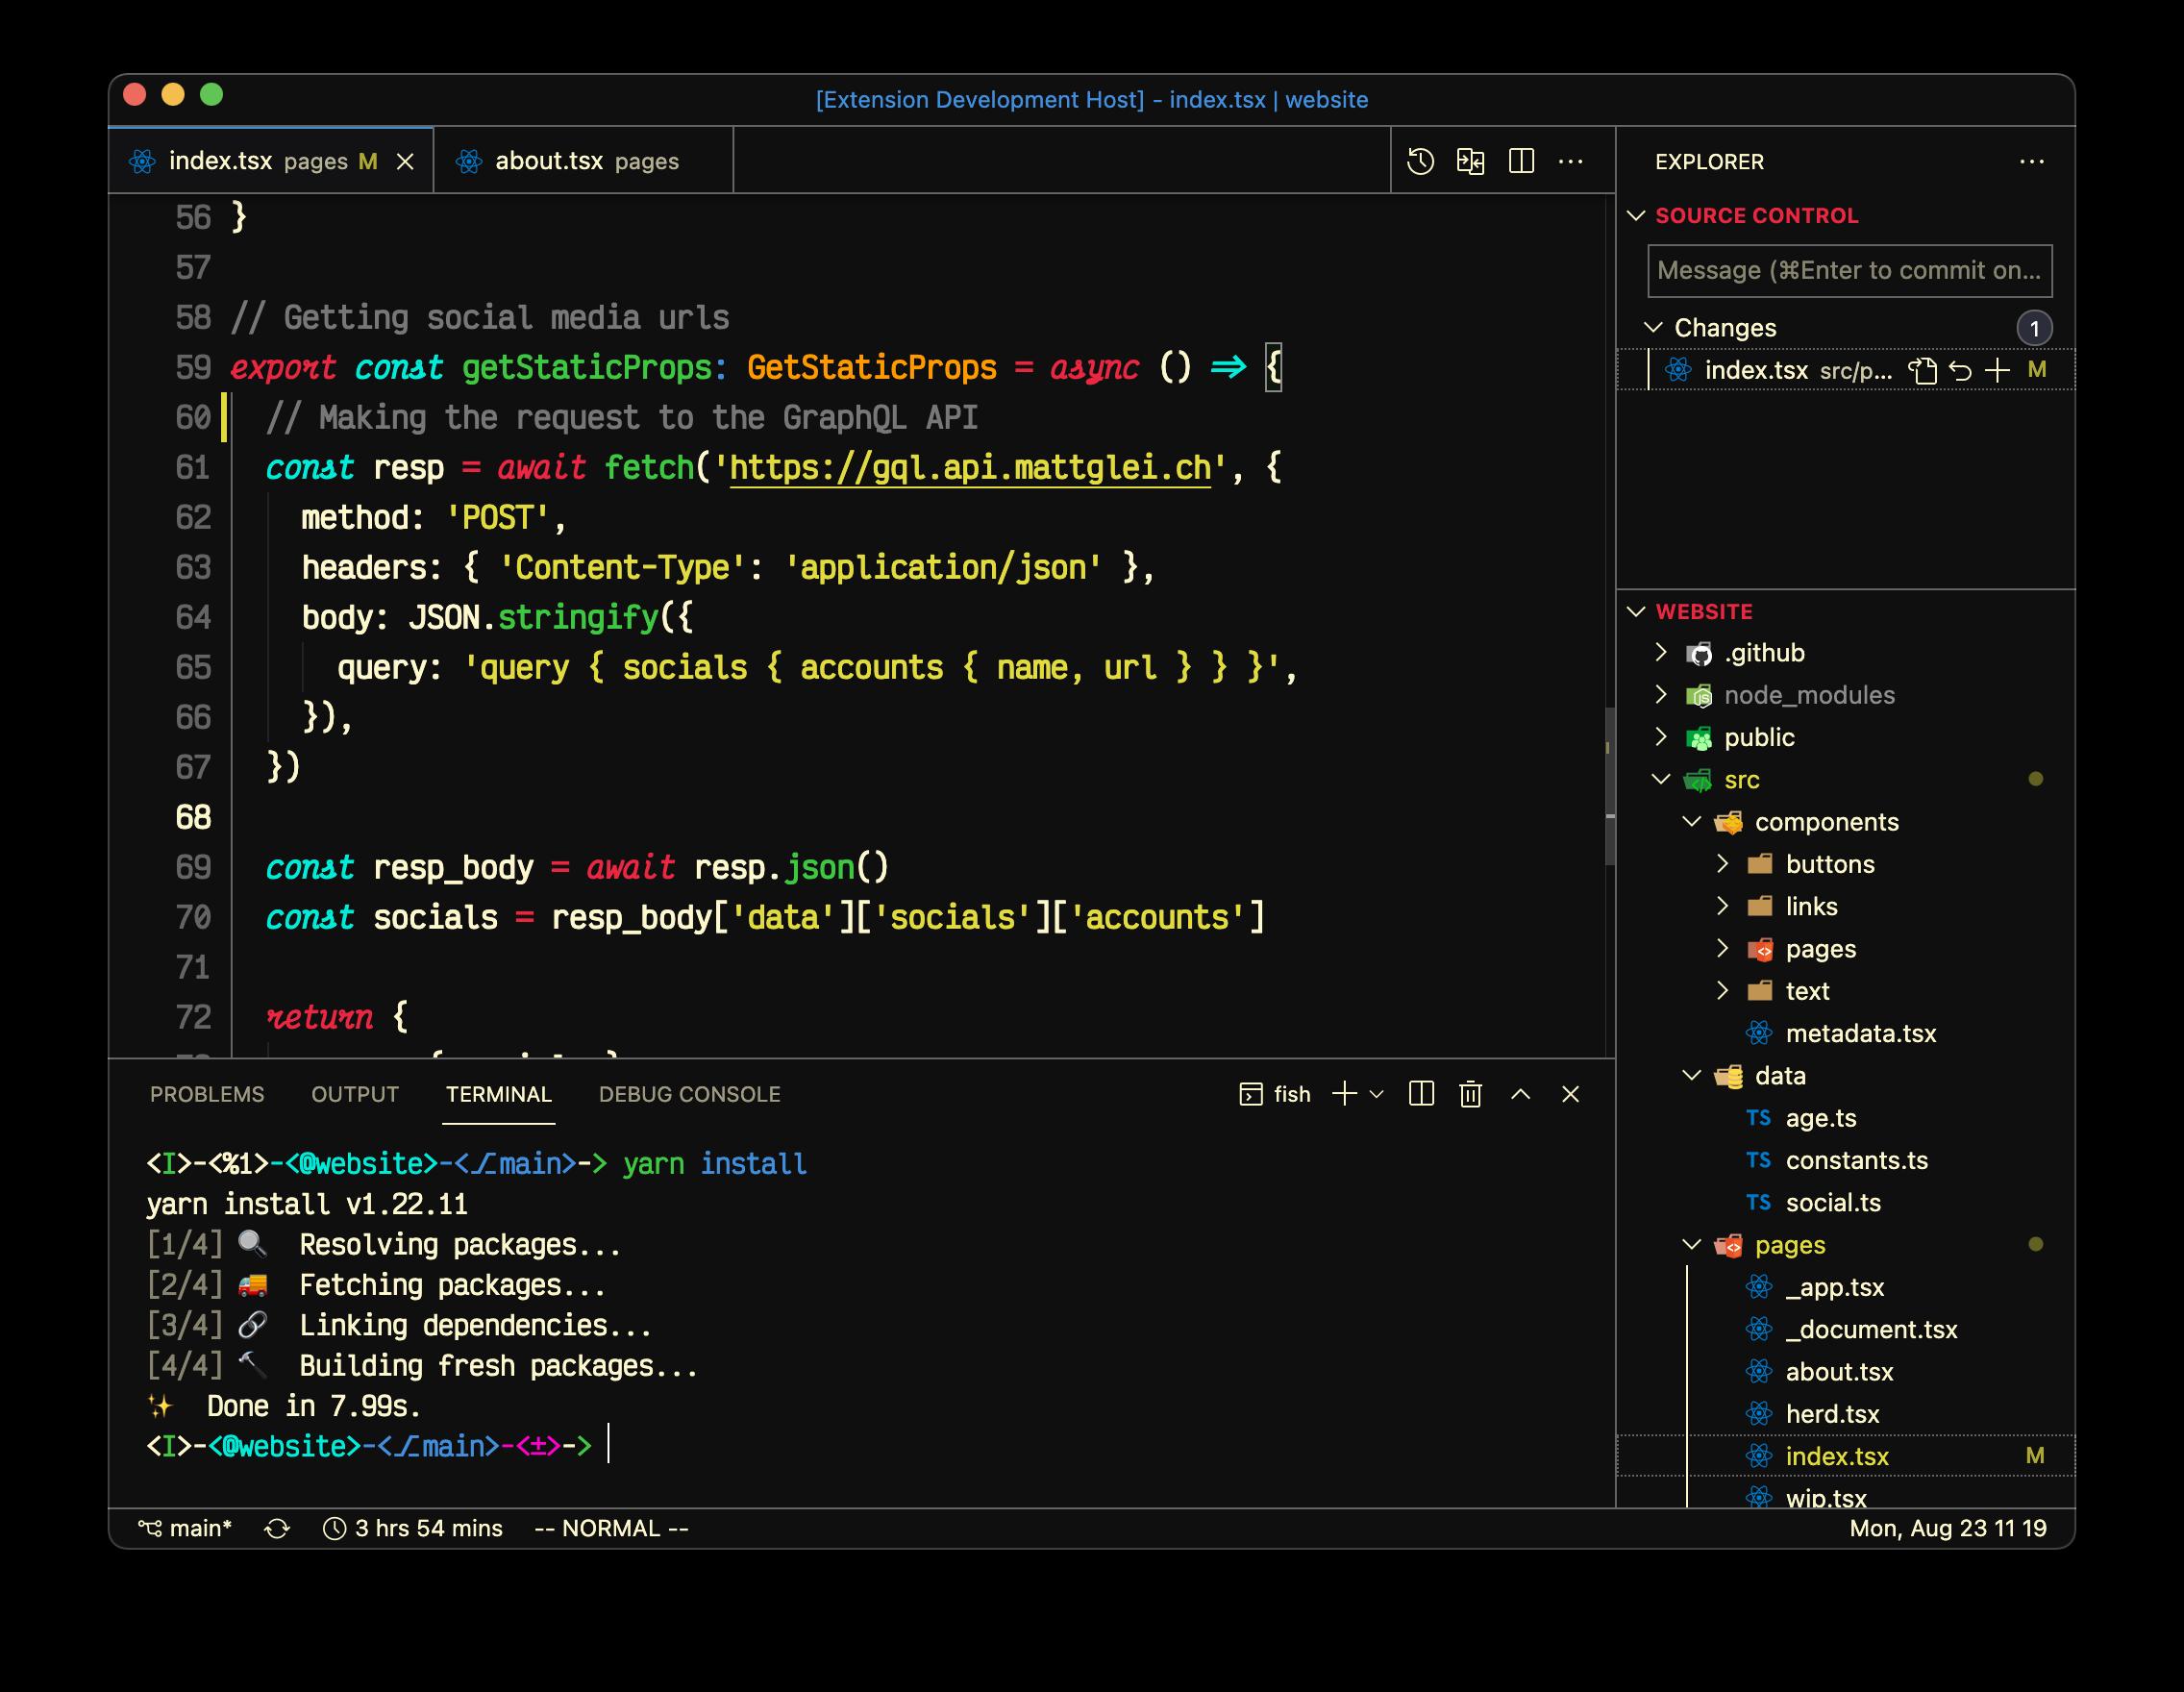 https://cloud-n2n7kmoej-hack-club-bot.vercel.app/0screen_shot_2021-08-23_at_11.19.57_pm.png